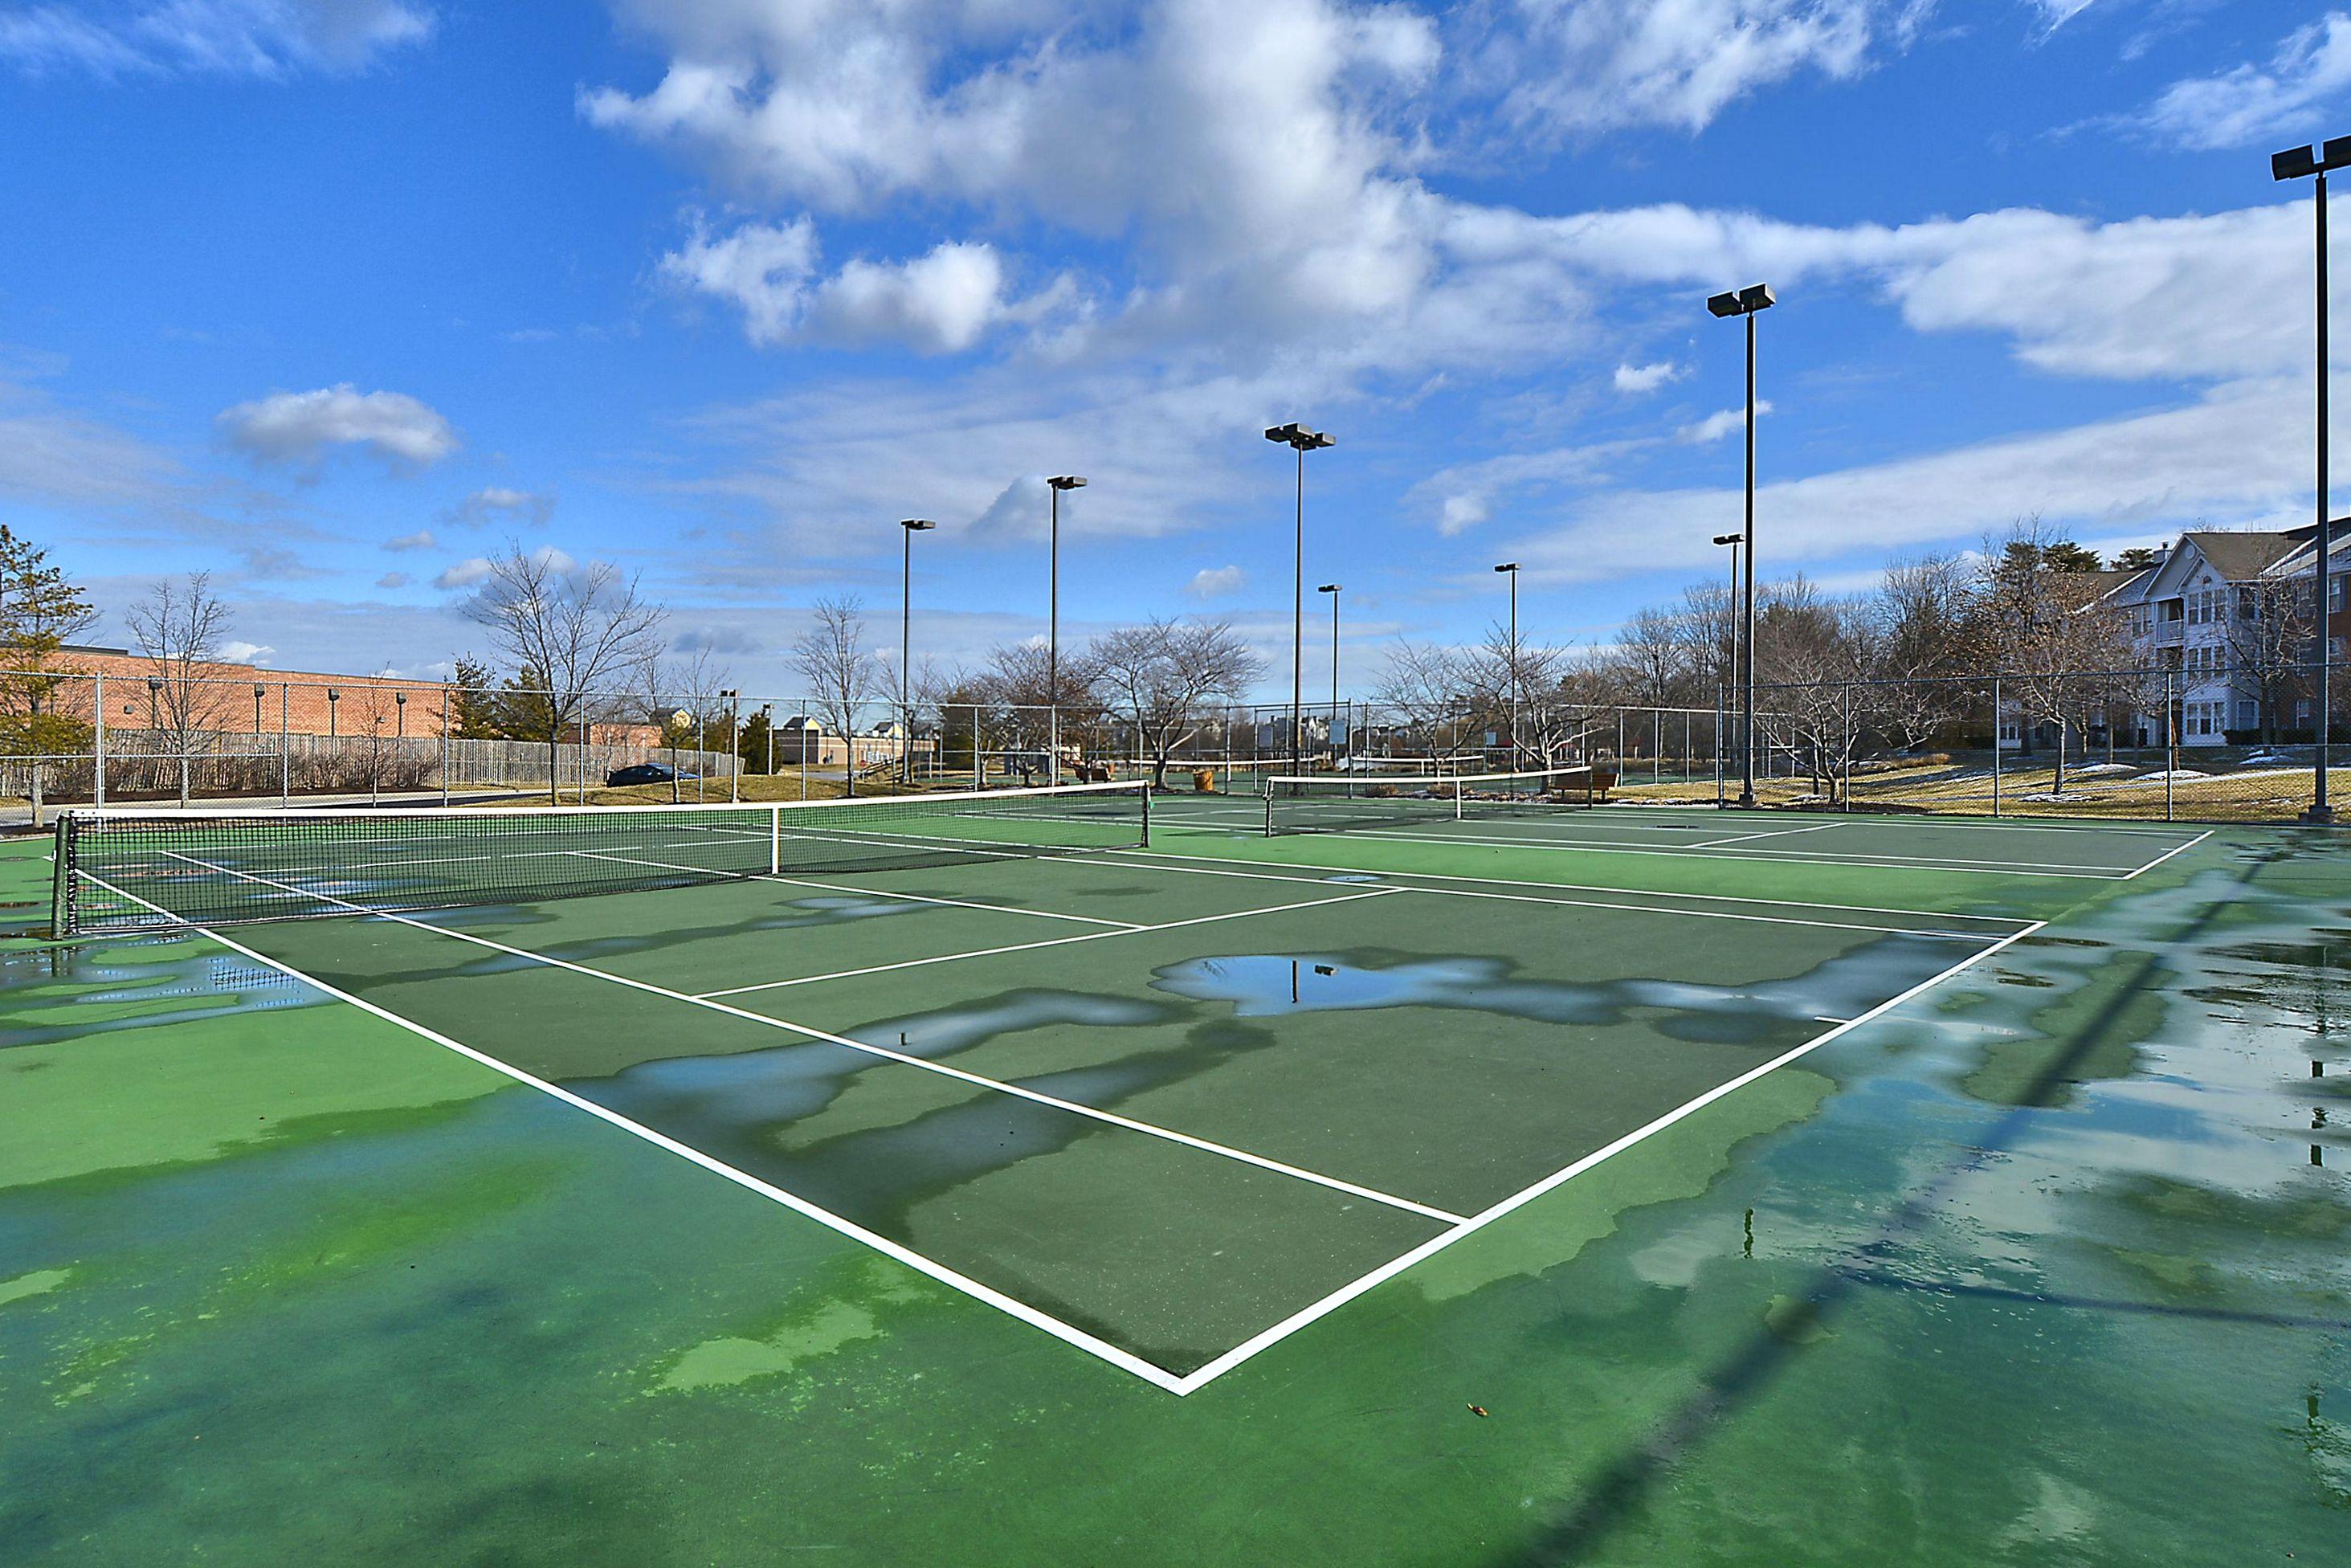 PIney Orchard tennis court